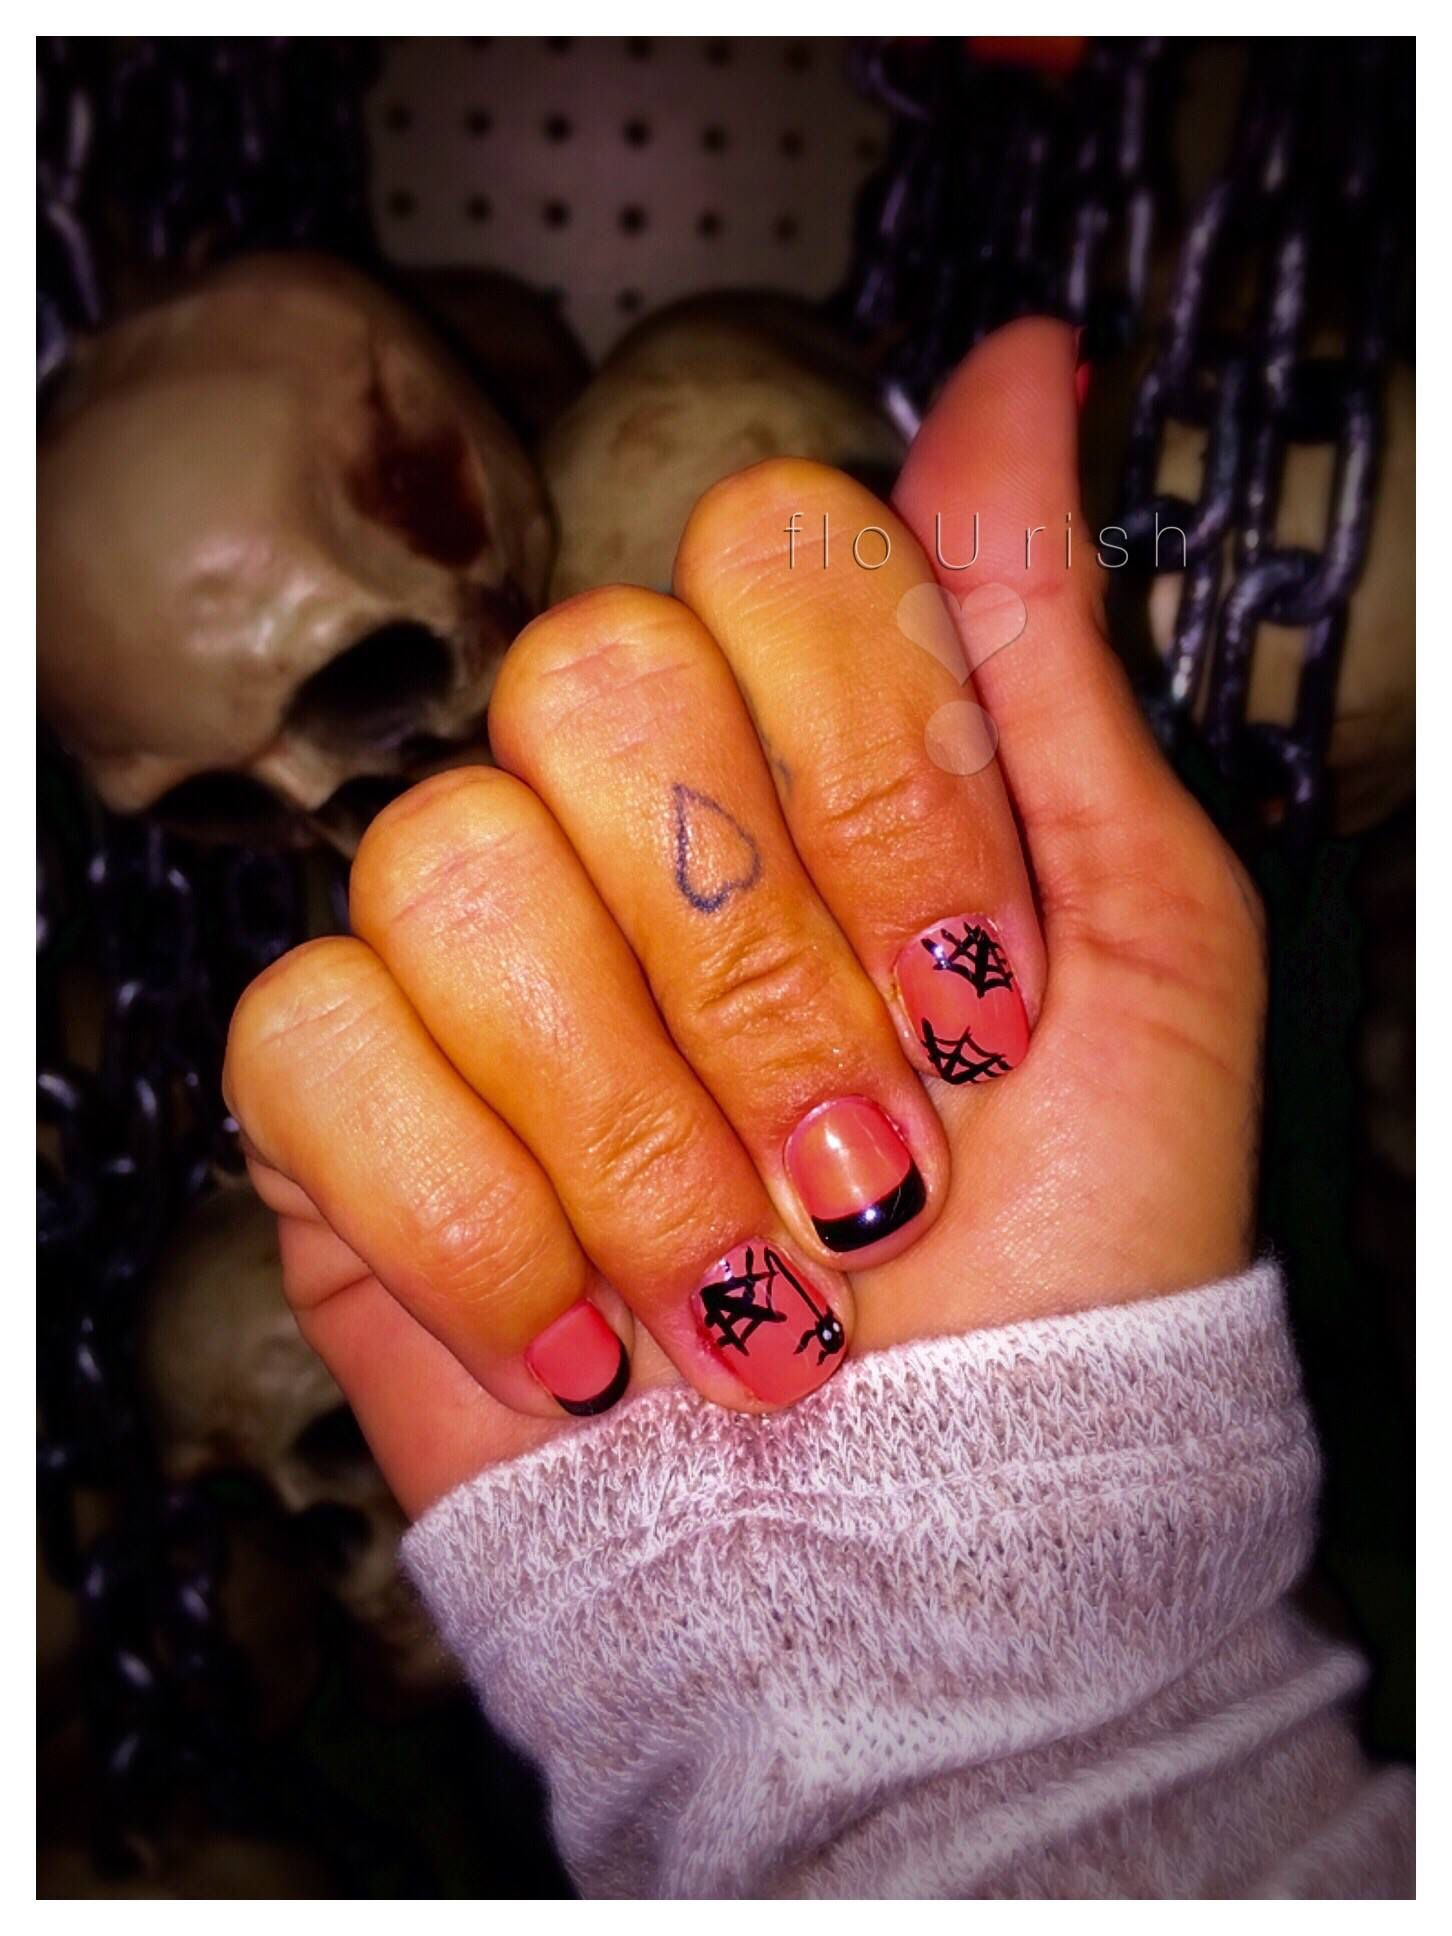 HalloweenNails #Spooky #freaky #weird #cute #designs #orange #black ...